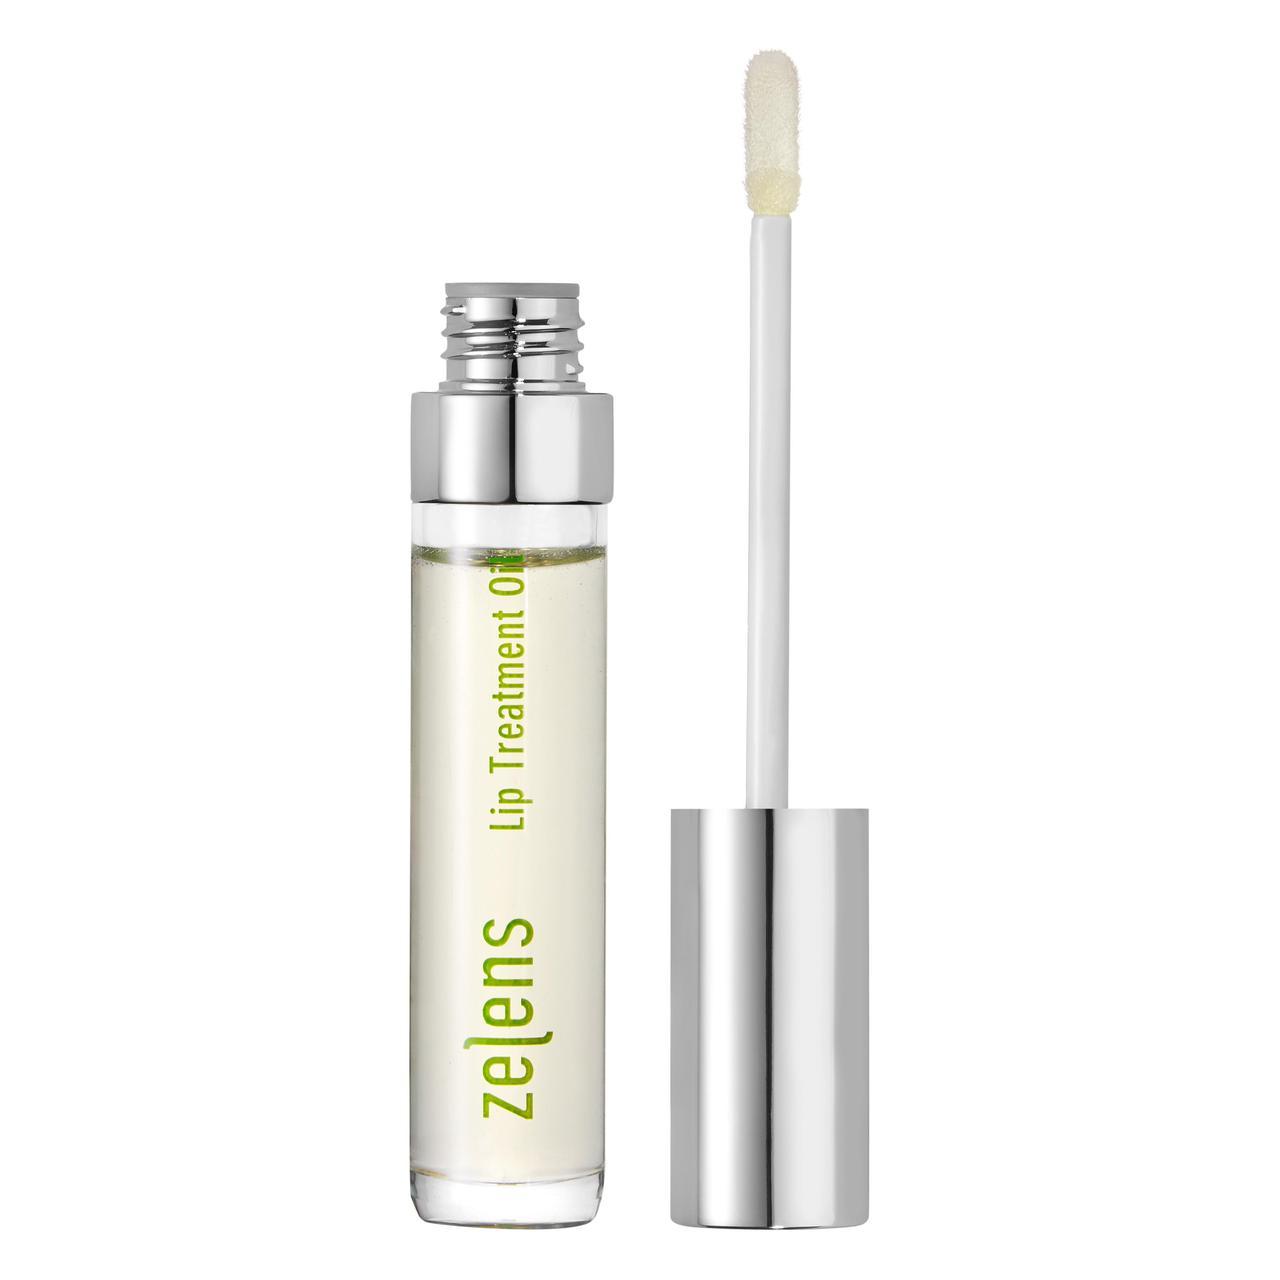 An image of Zelens Lip Treatment Oil